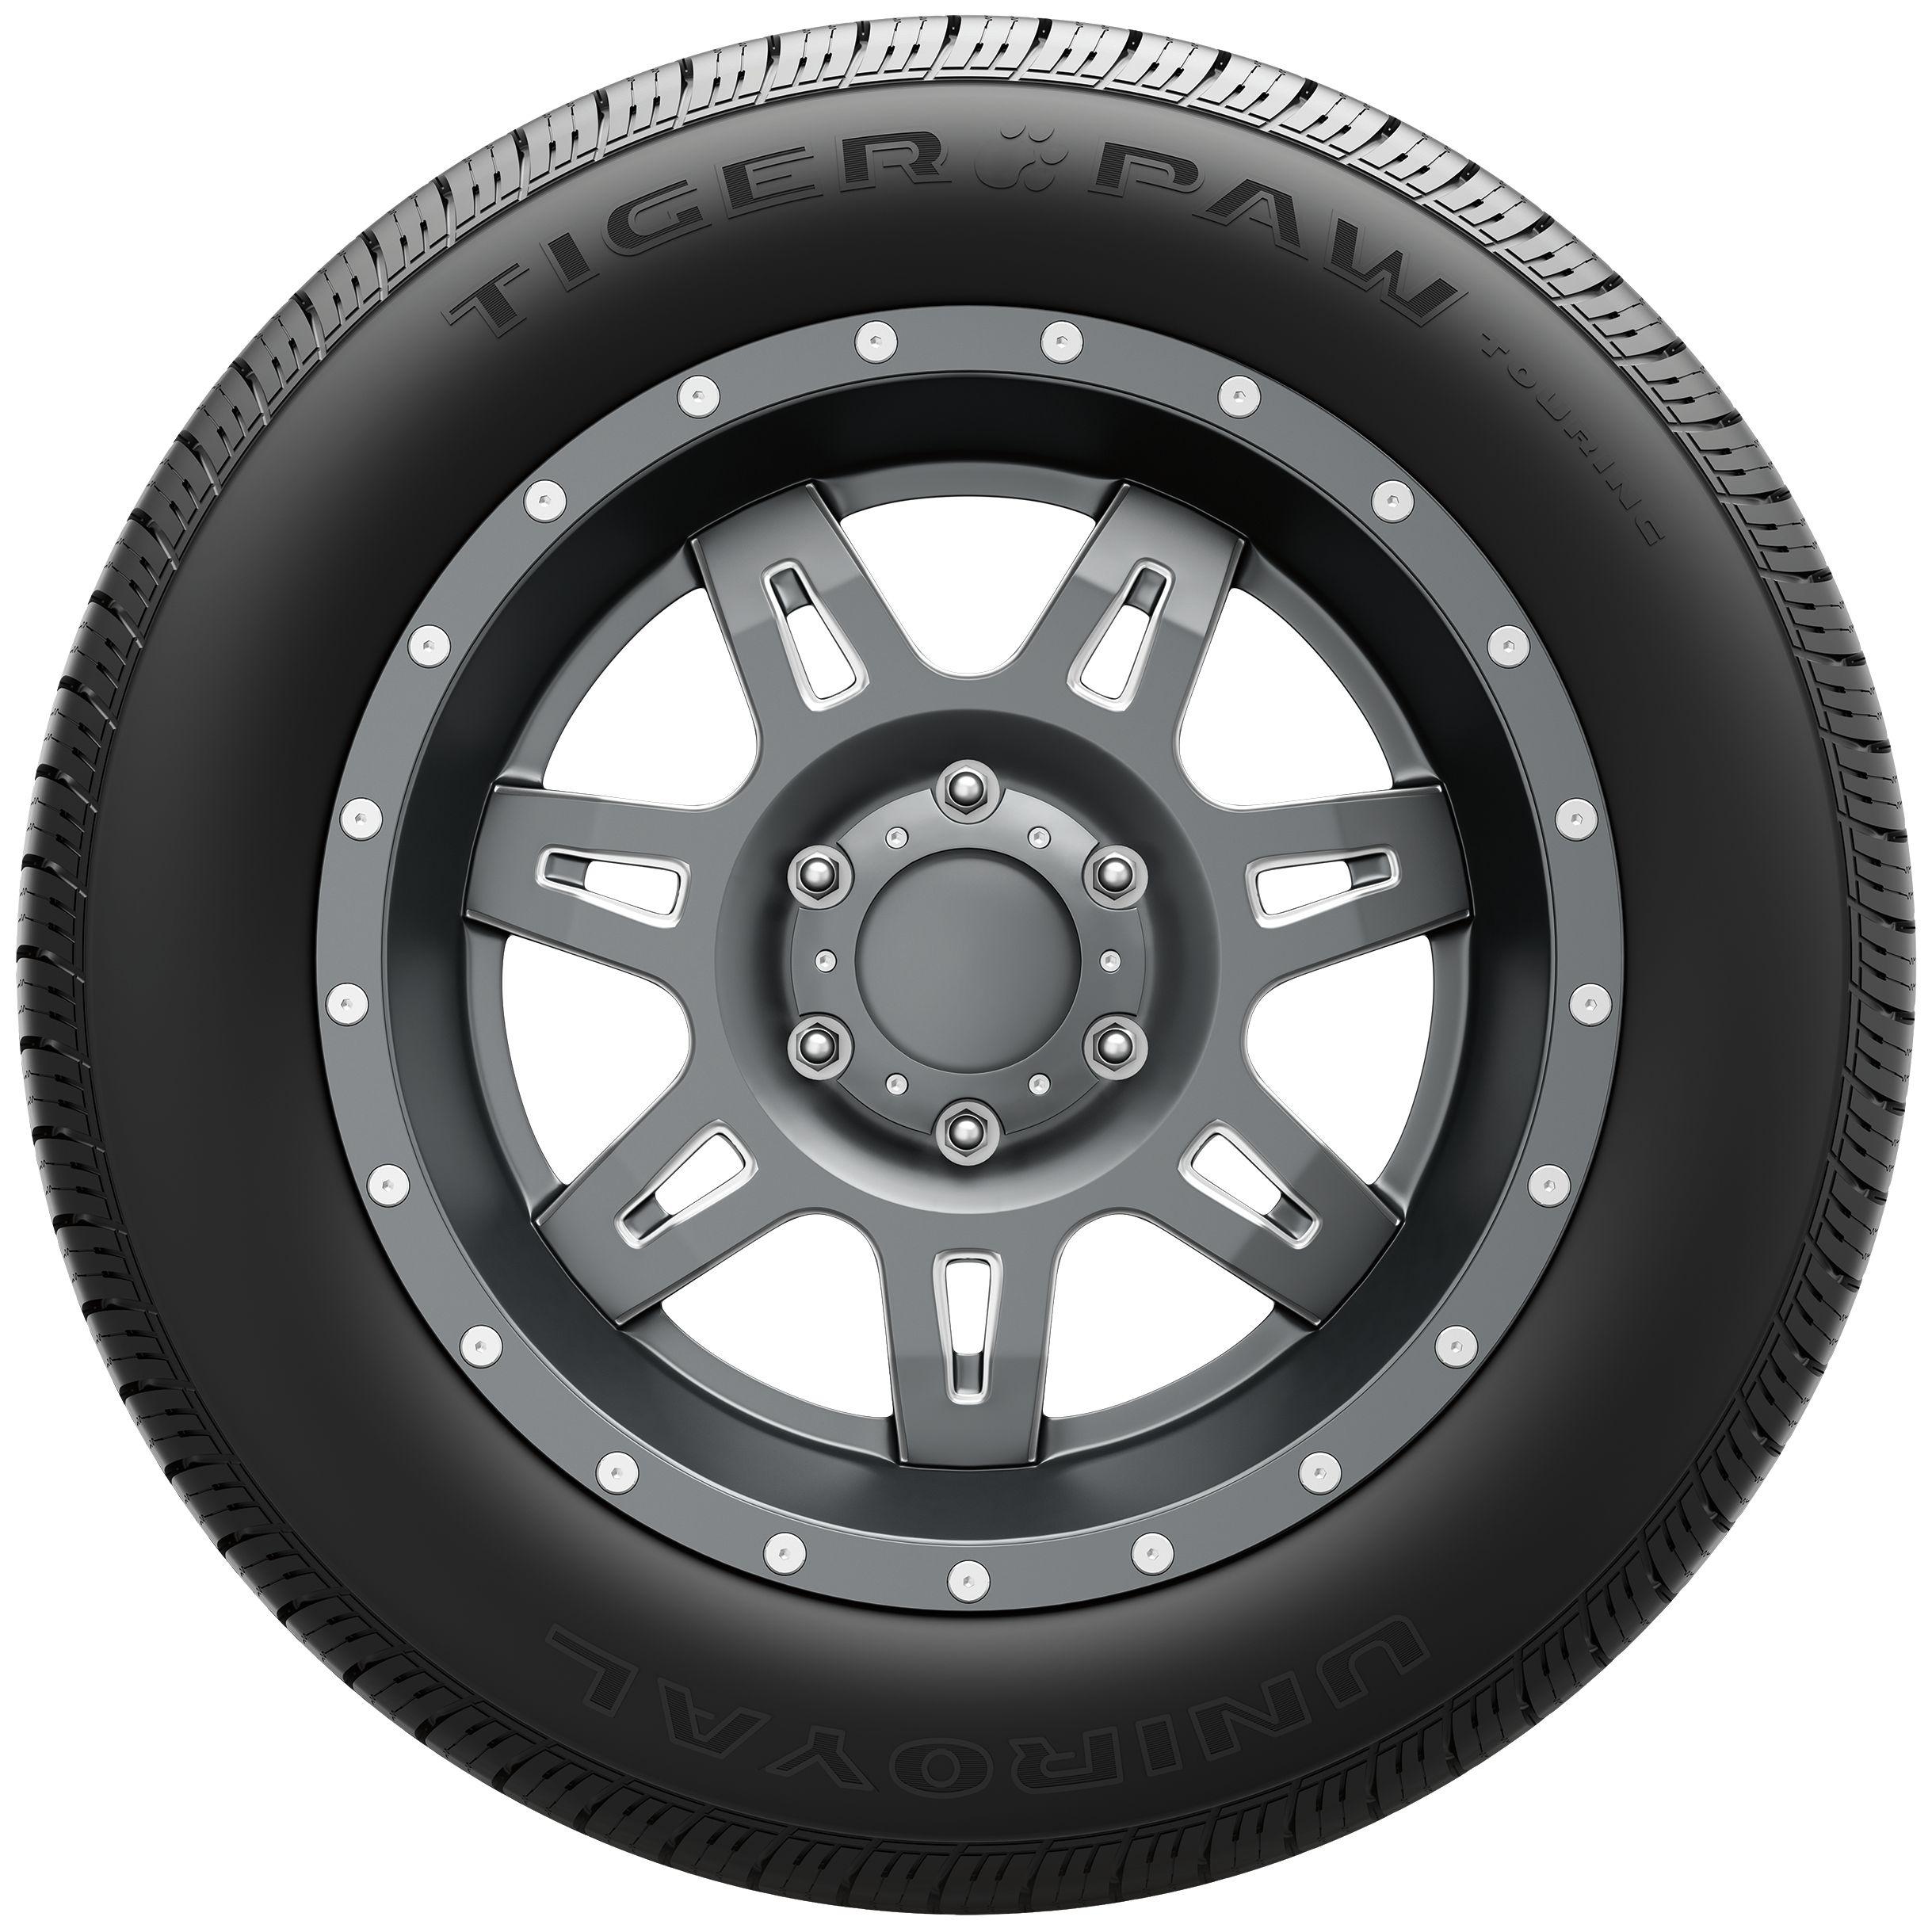 Uniroyal Tiger Paw Touring Highway Tire 225 50r17 94t Walmart Com